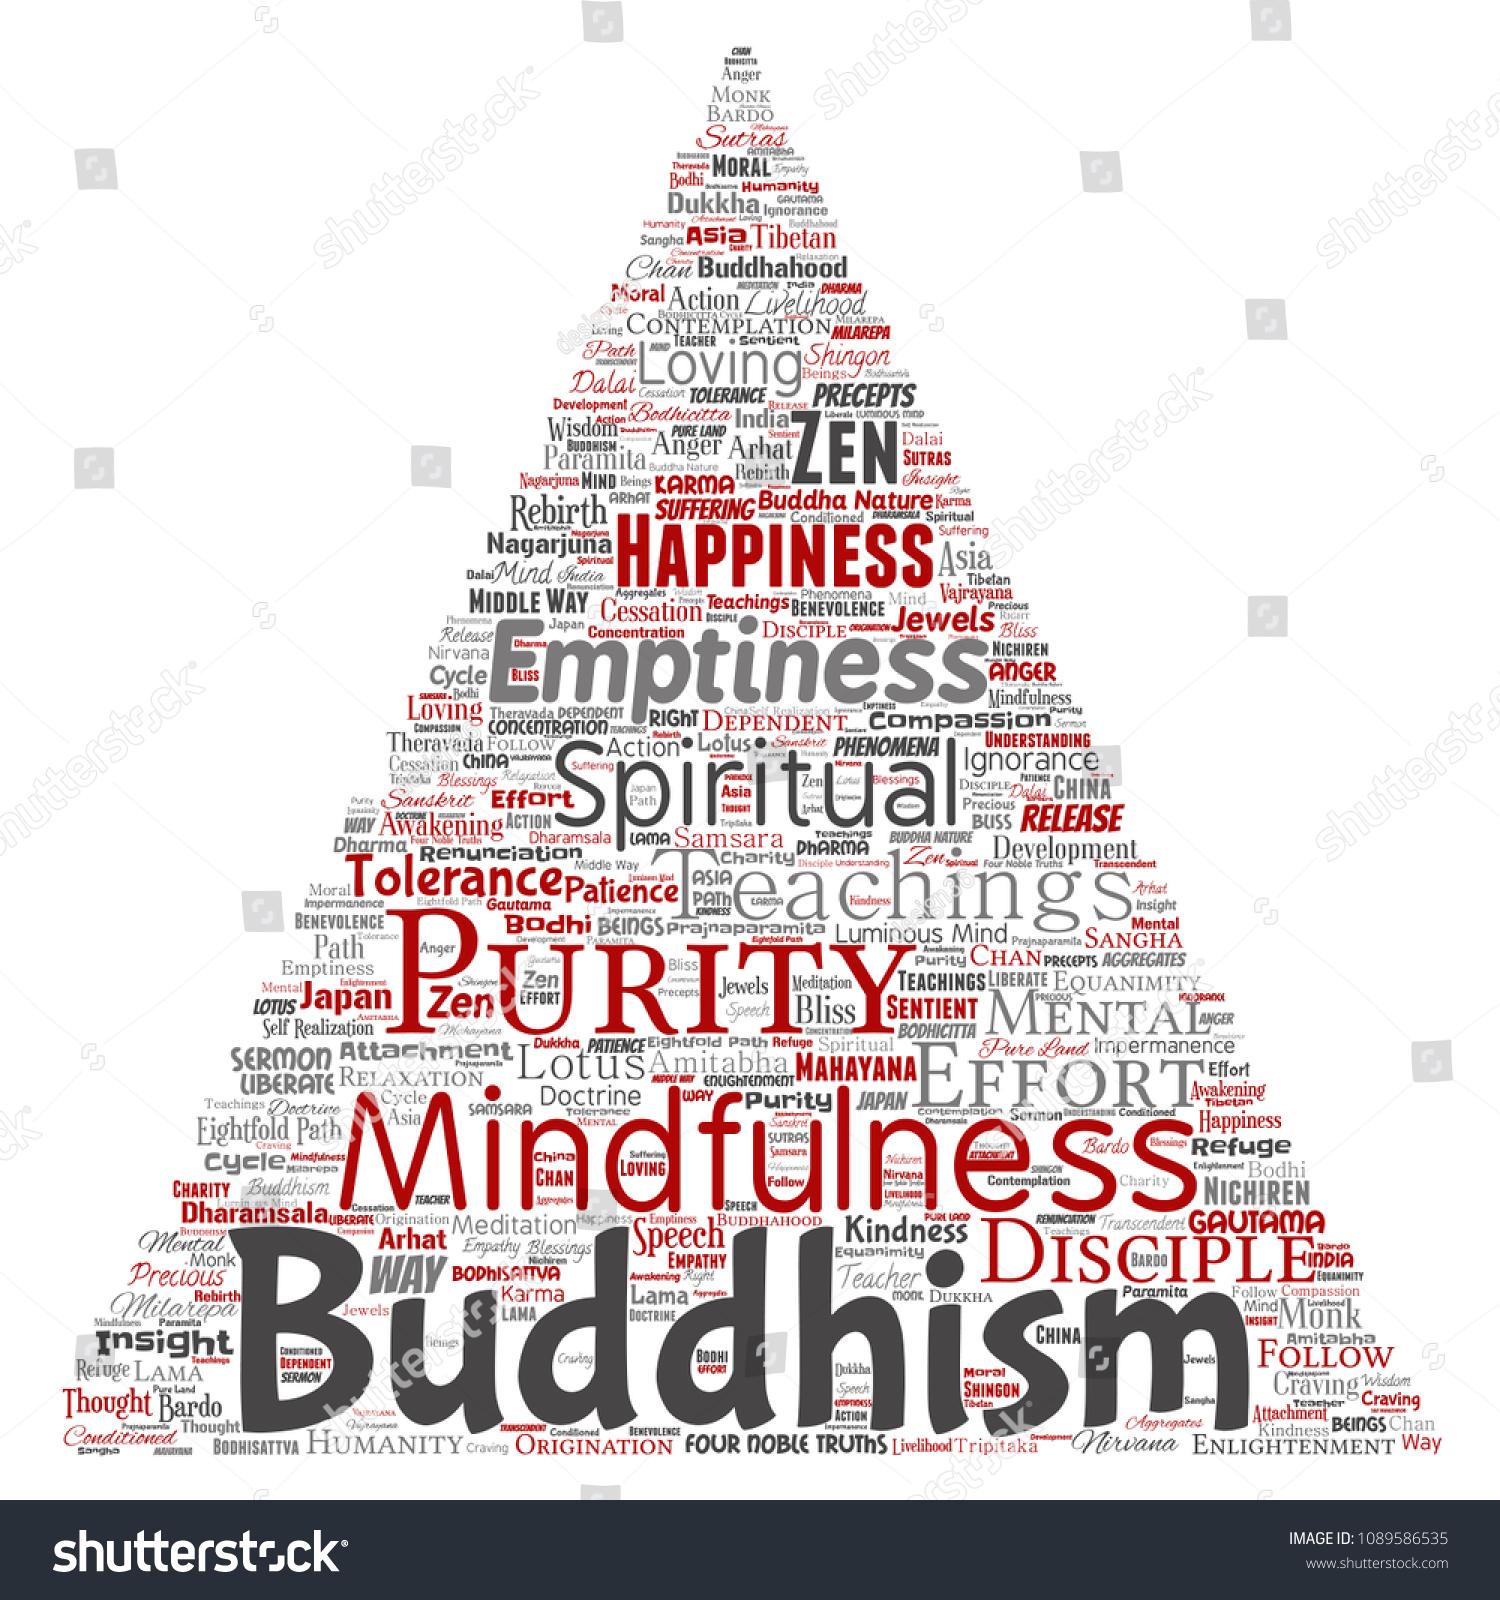 2019 year looks- Buddhism karma